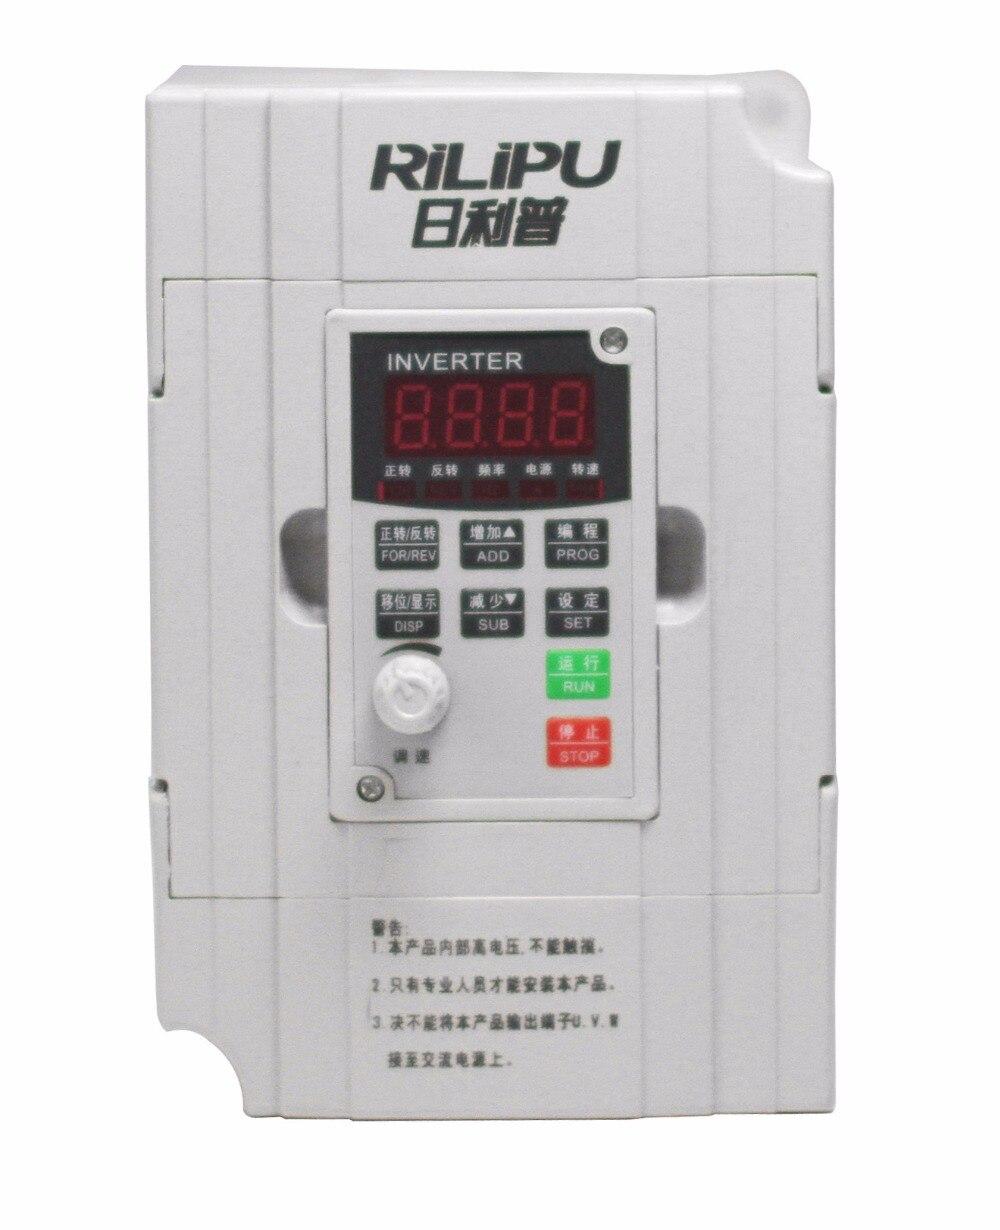 лучшая цена RiLiPu Inverter VFD Frequency Converter 220v 1.5KW Common-use Output 3-phases 220v free shipping